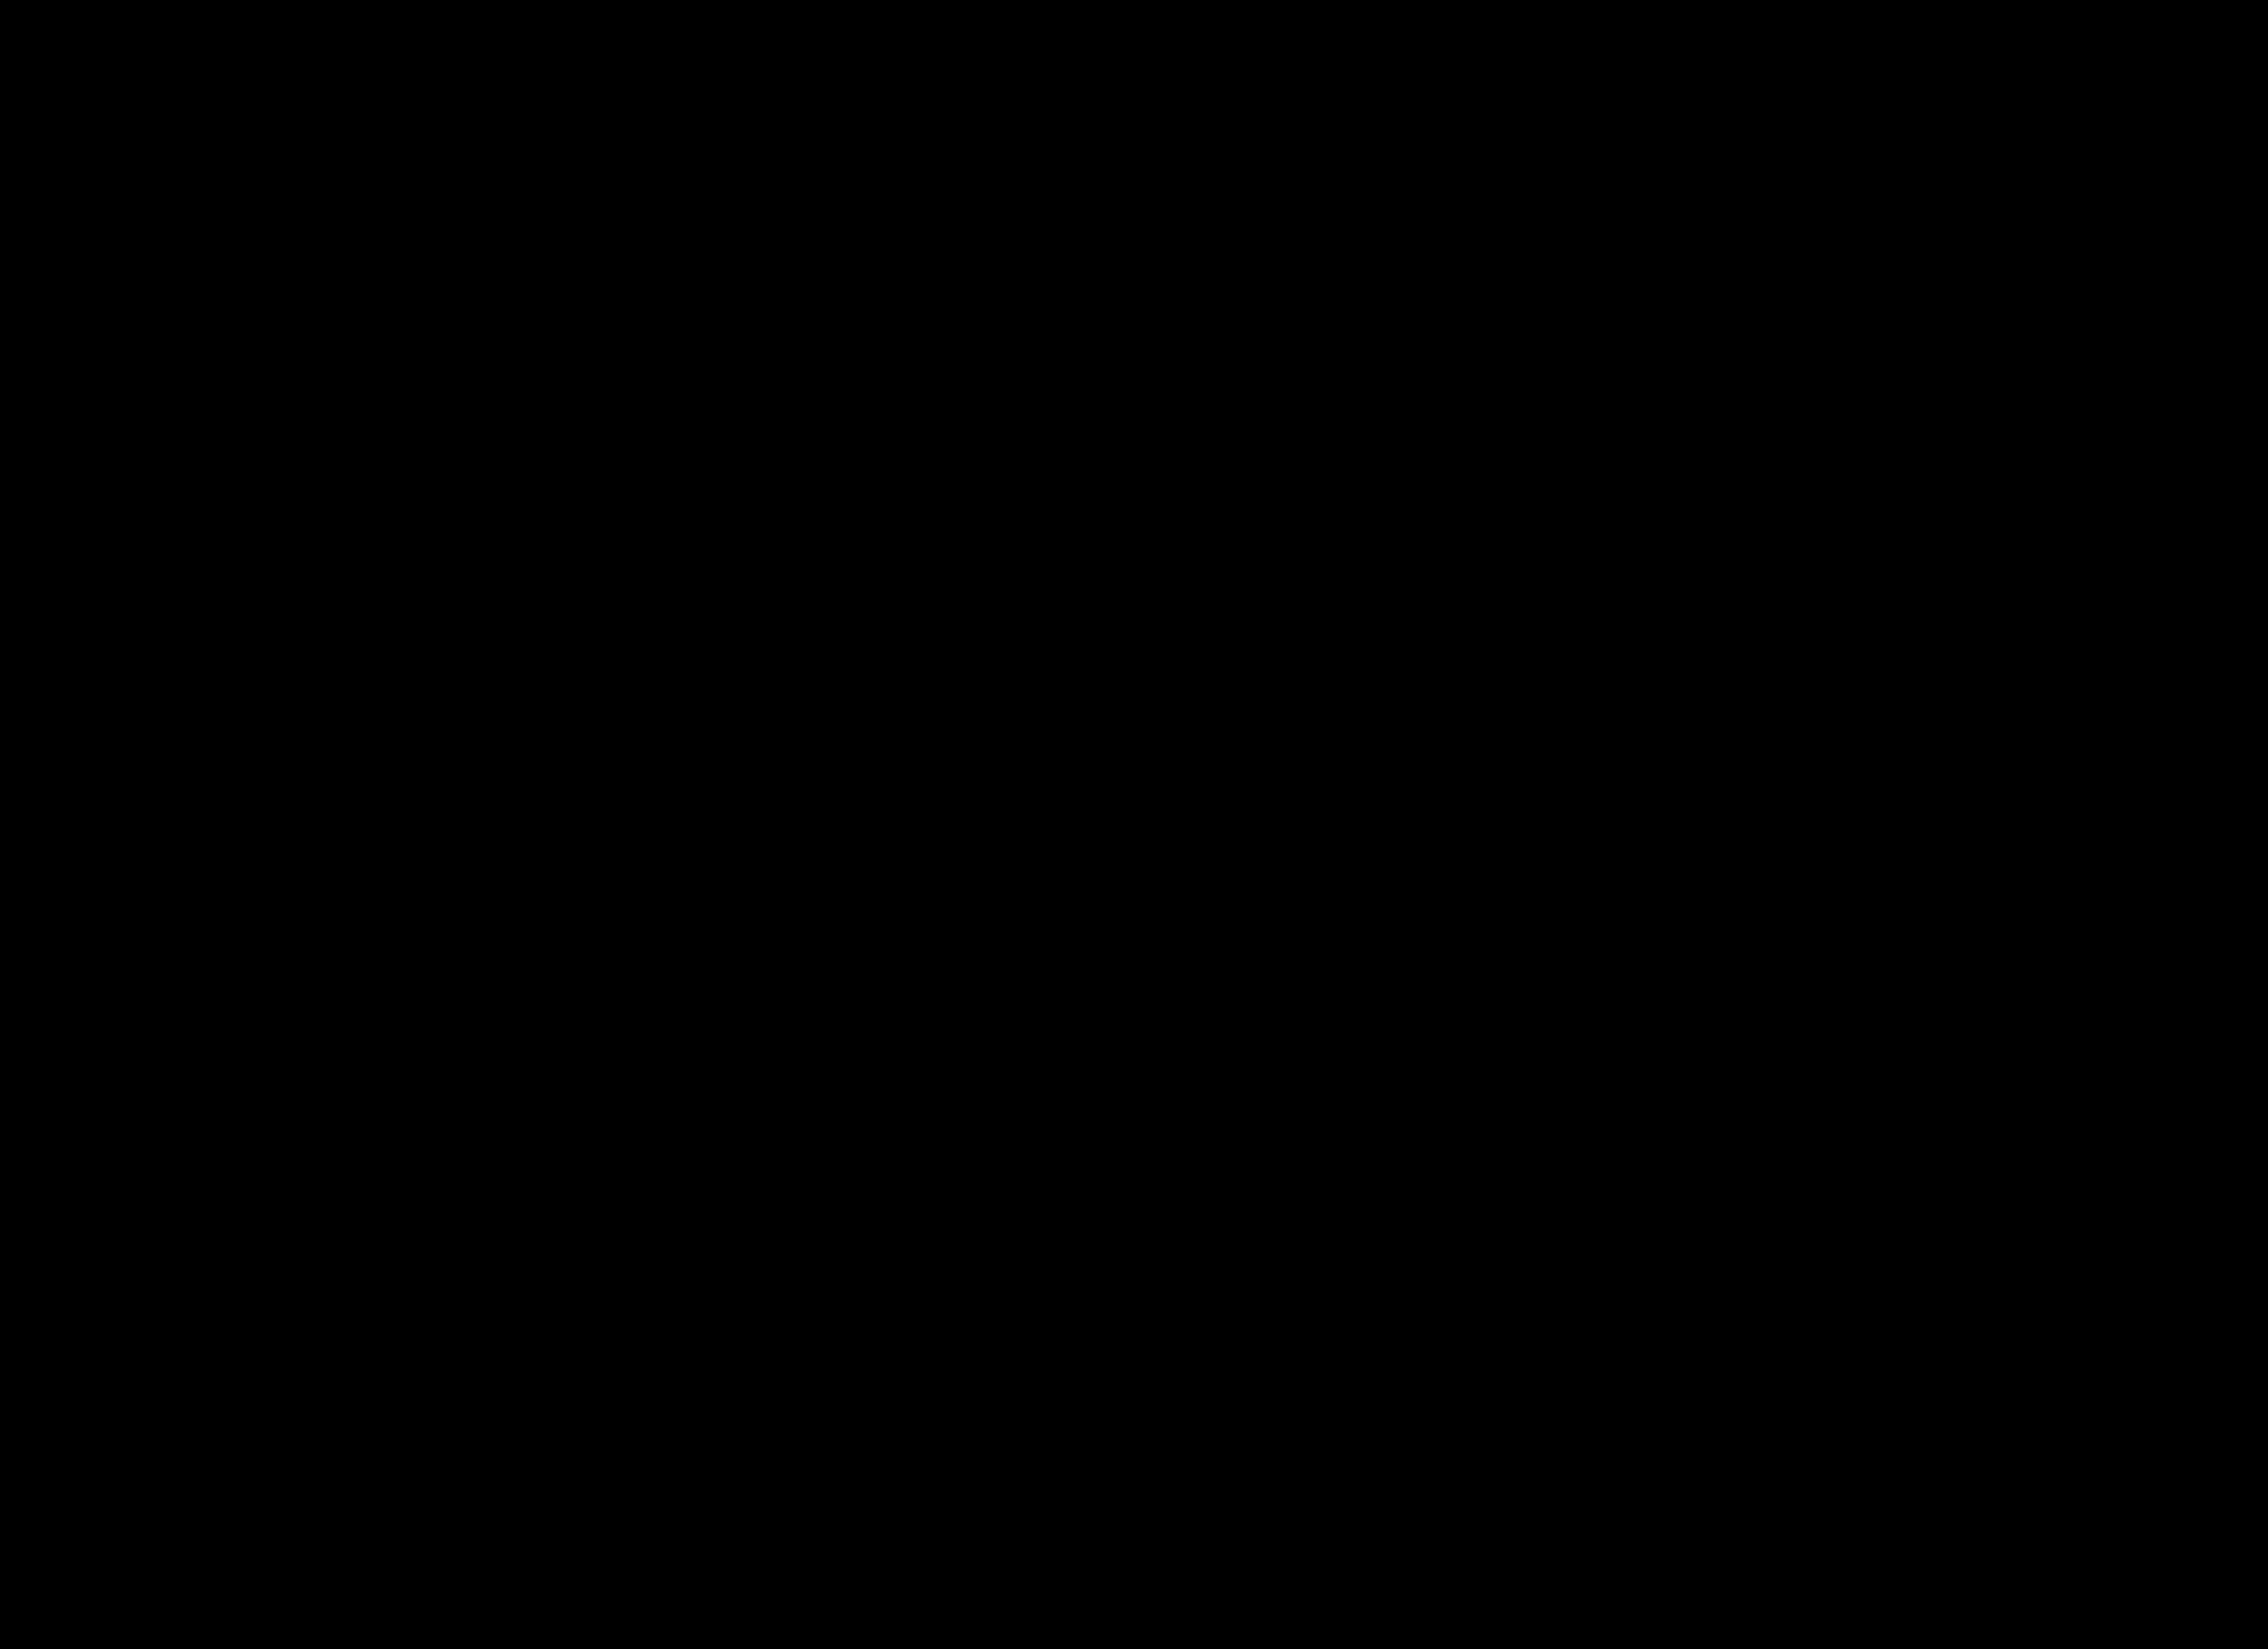 Fluttershy Umm Face Outline By Alloutlol